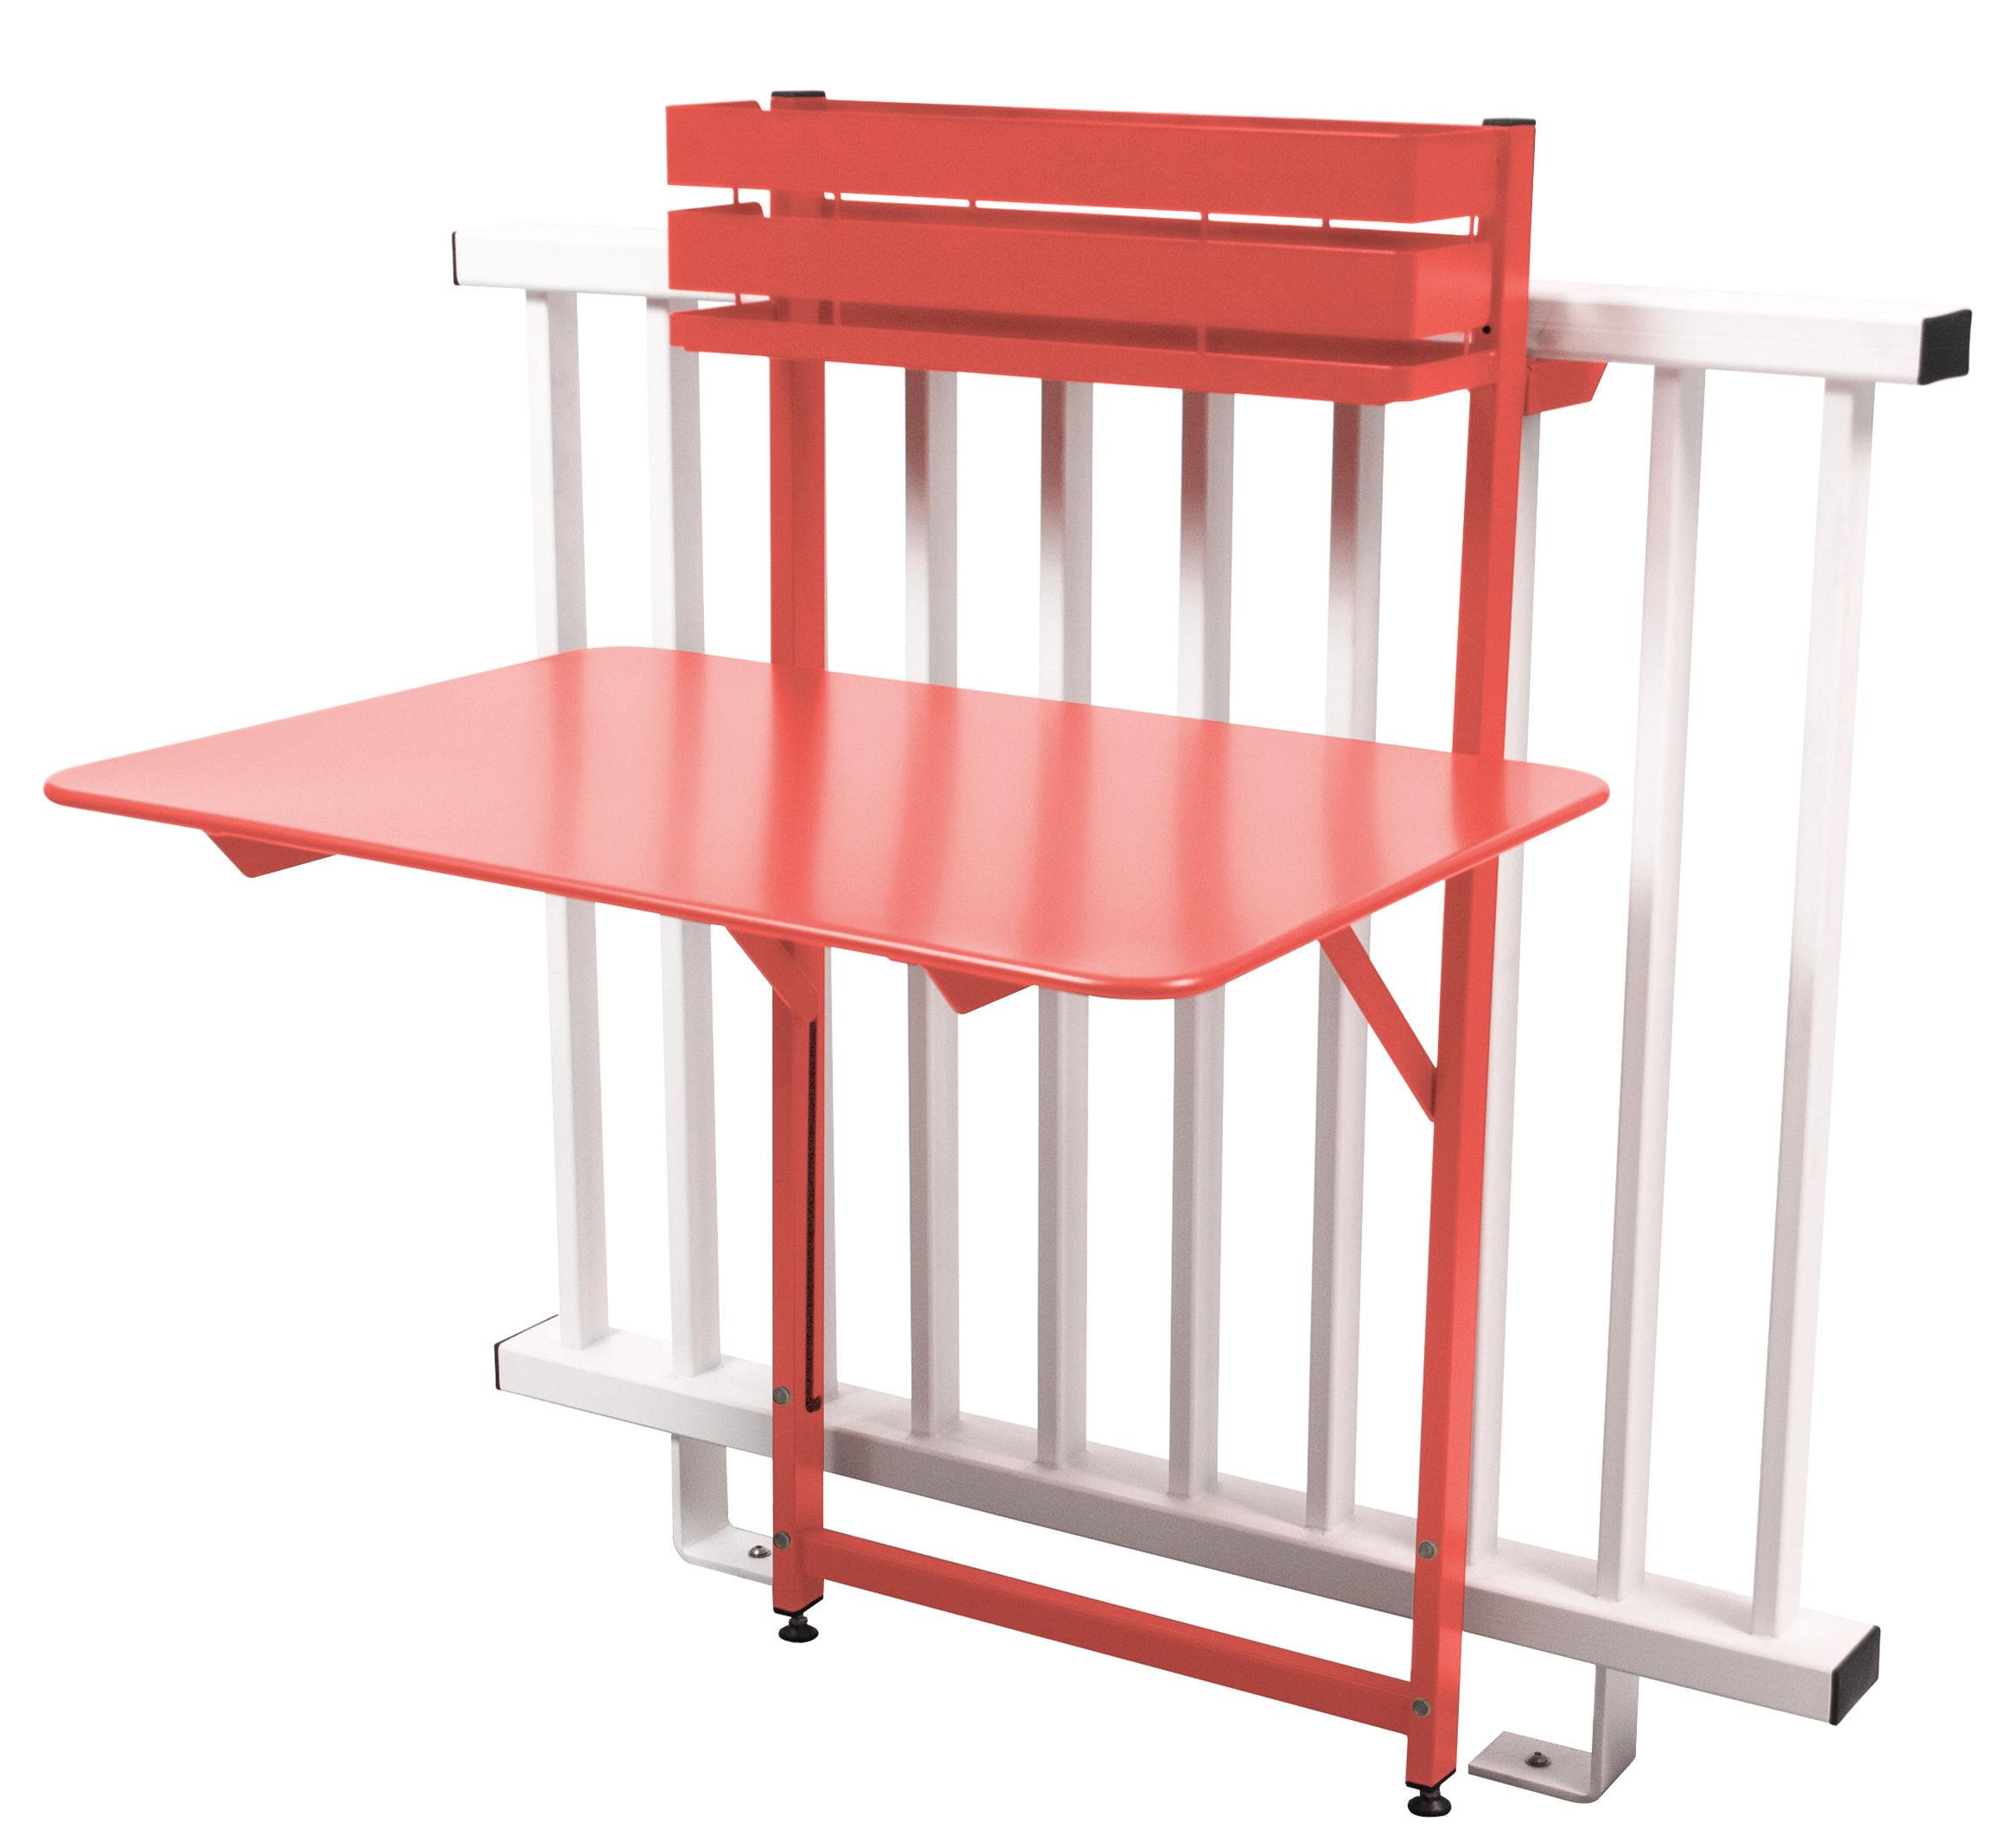 table pliante balcon bistro rabattable 77 x 64 cm capucine fermob. Black Bedroom Furniture Sets. Home Design Ideas